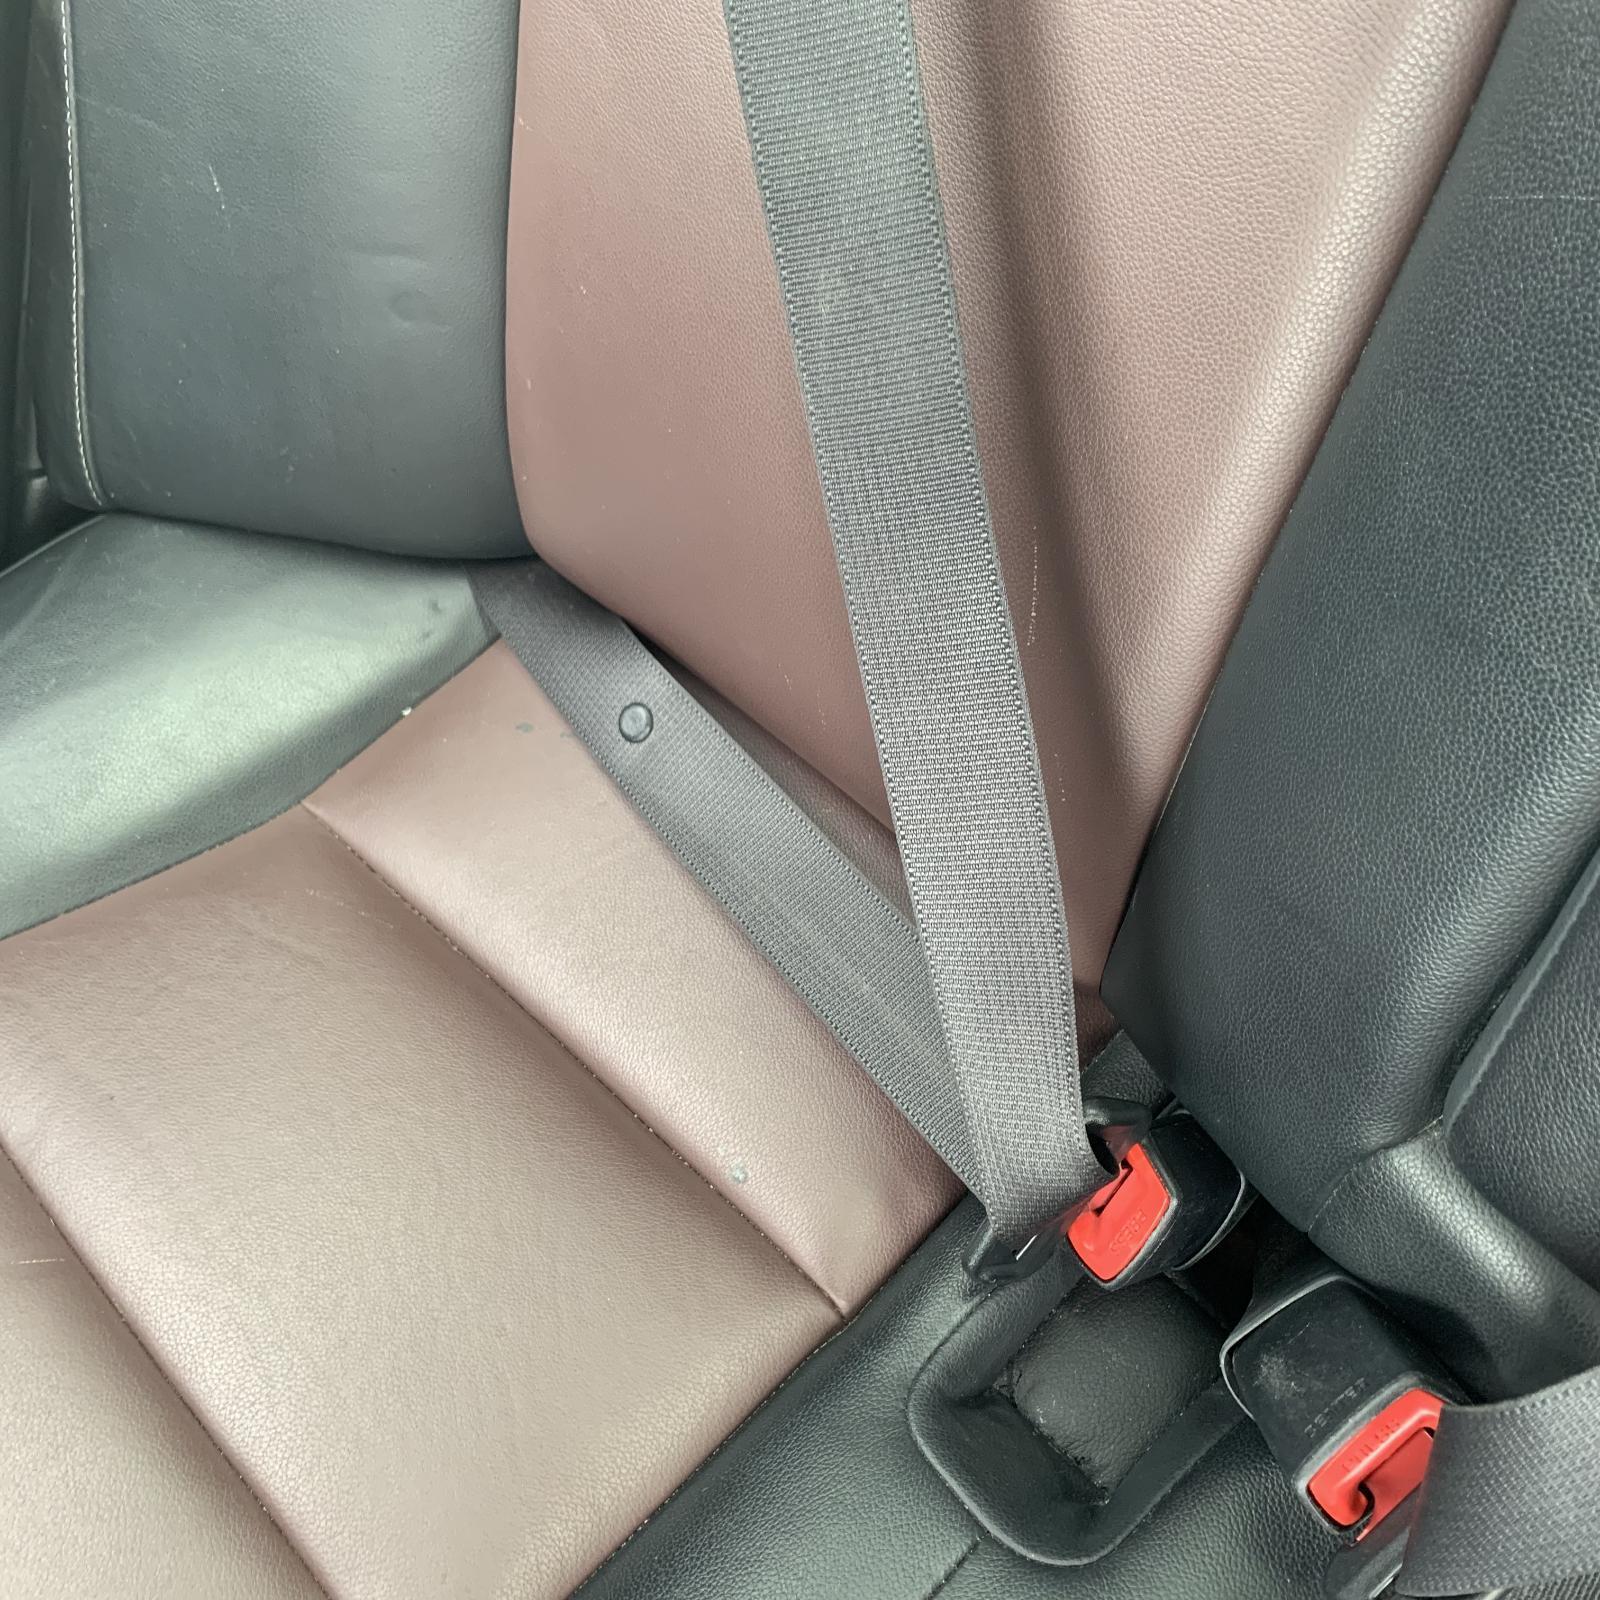 TOYOTA AURION, Seatbelt/Stalk, RH REAR, SEAT BELT STALK ONLY, GSV50R, 02/12-08/17